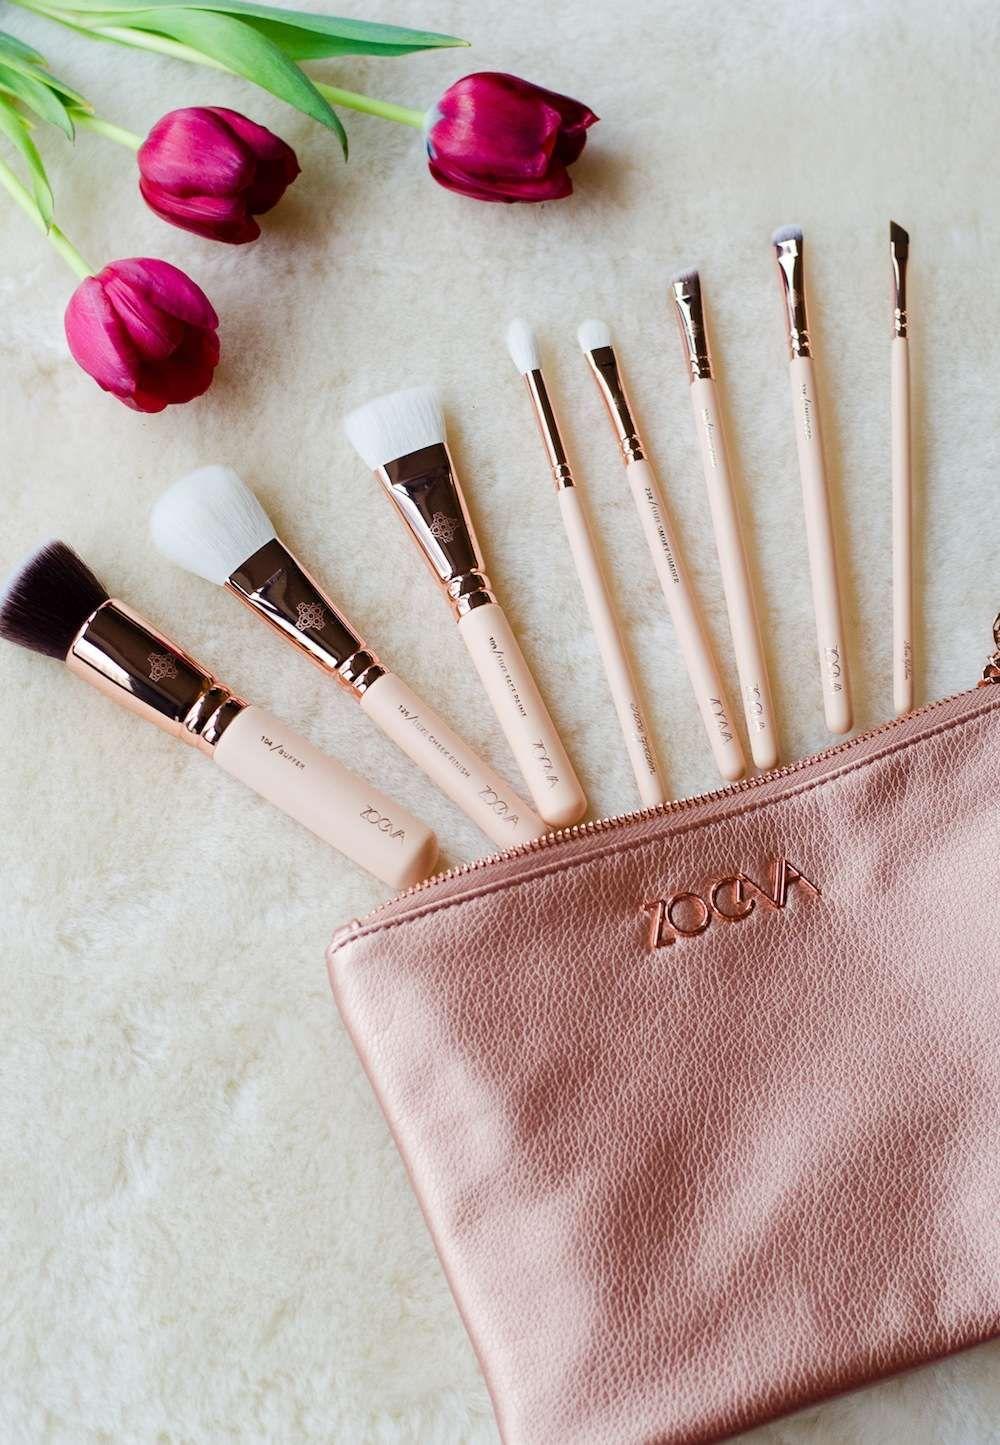 ZOEVA Rose Gold Luxury Set Vol.2 Makeup Brushes Review